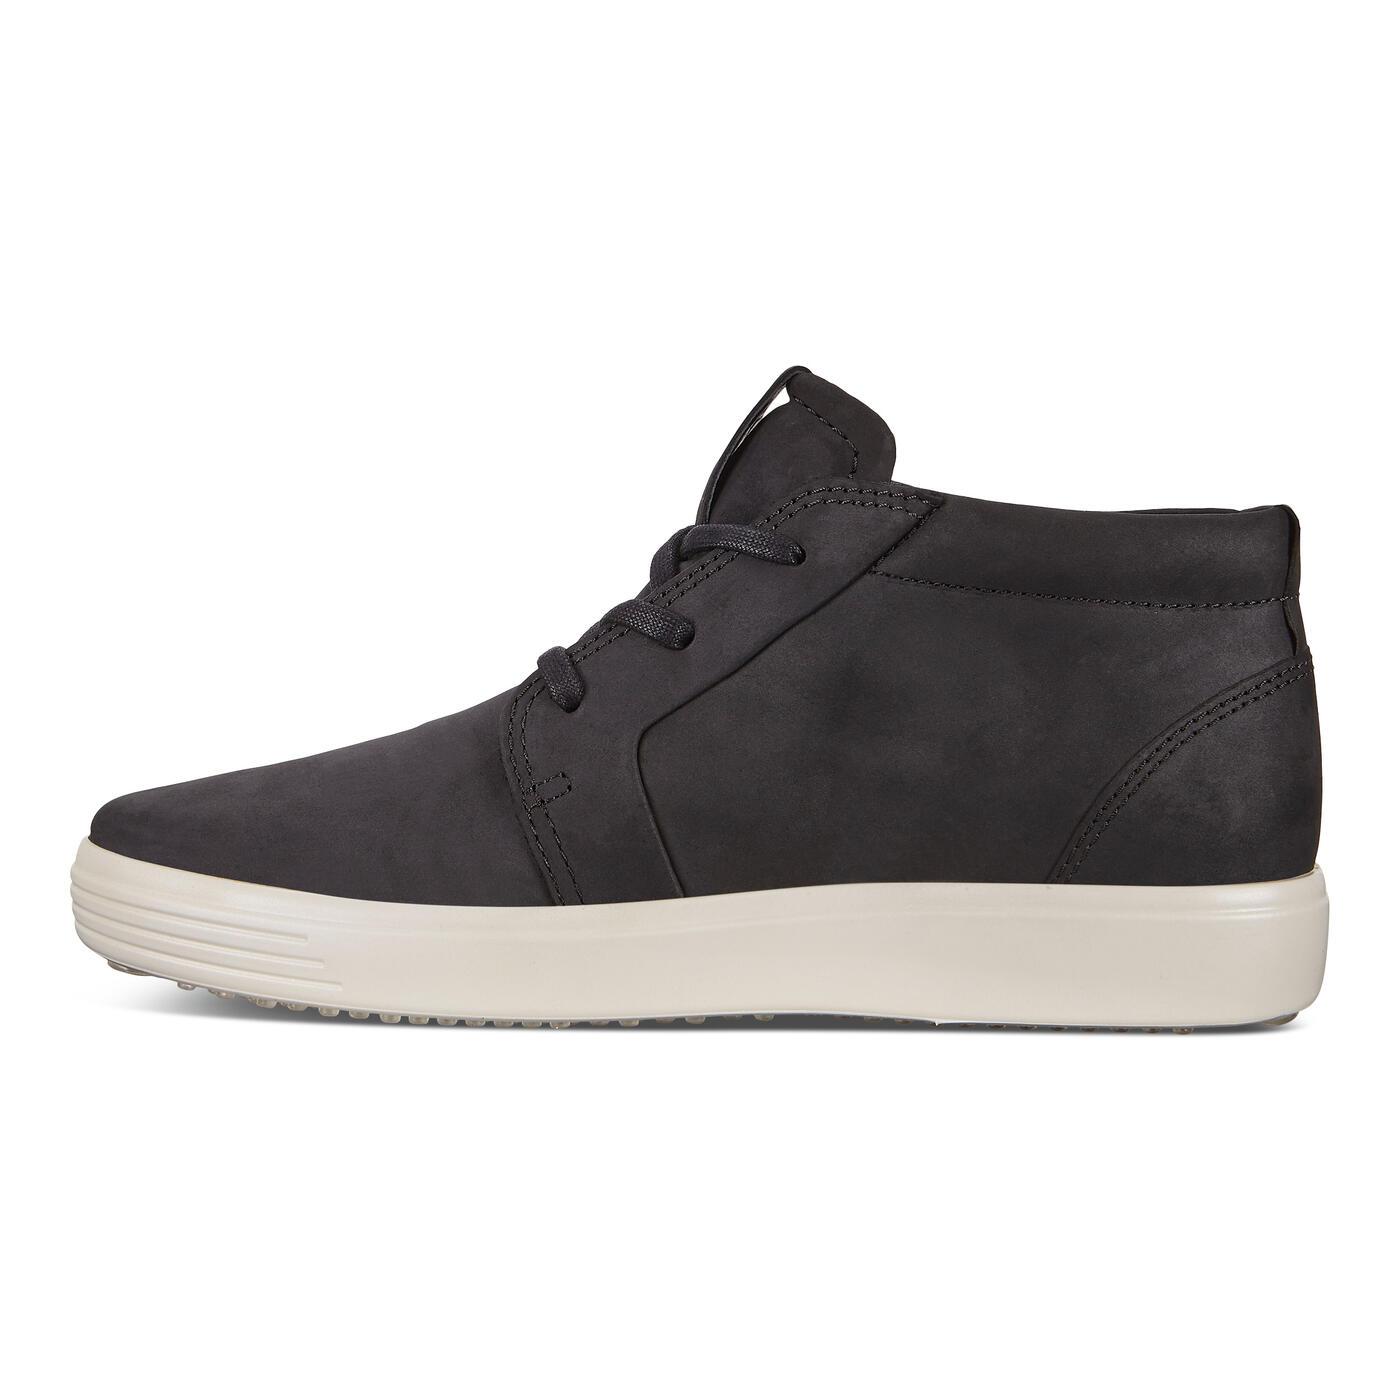 ECCO Soft 7 Men's Ankle Sneaker